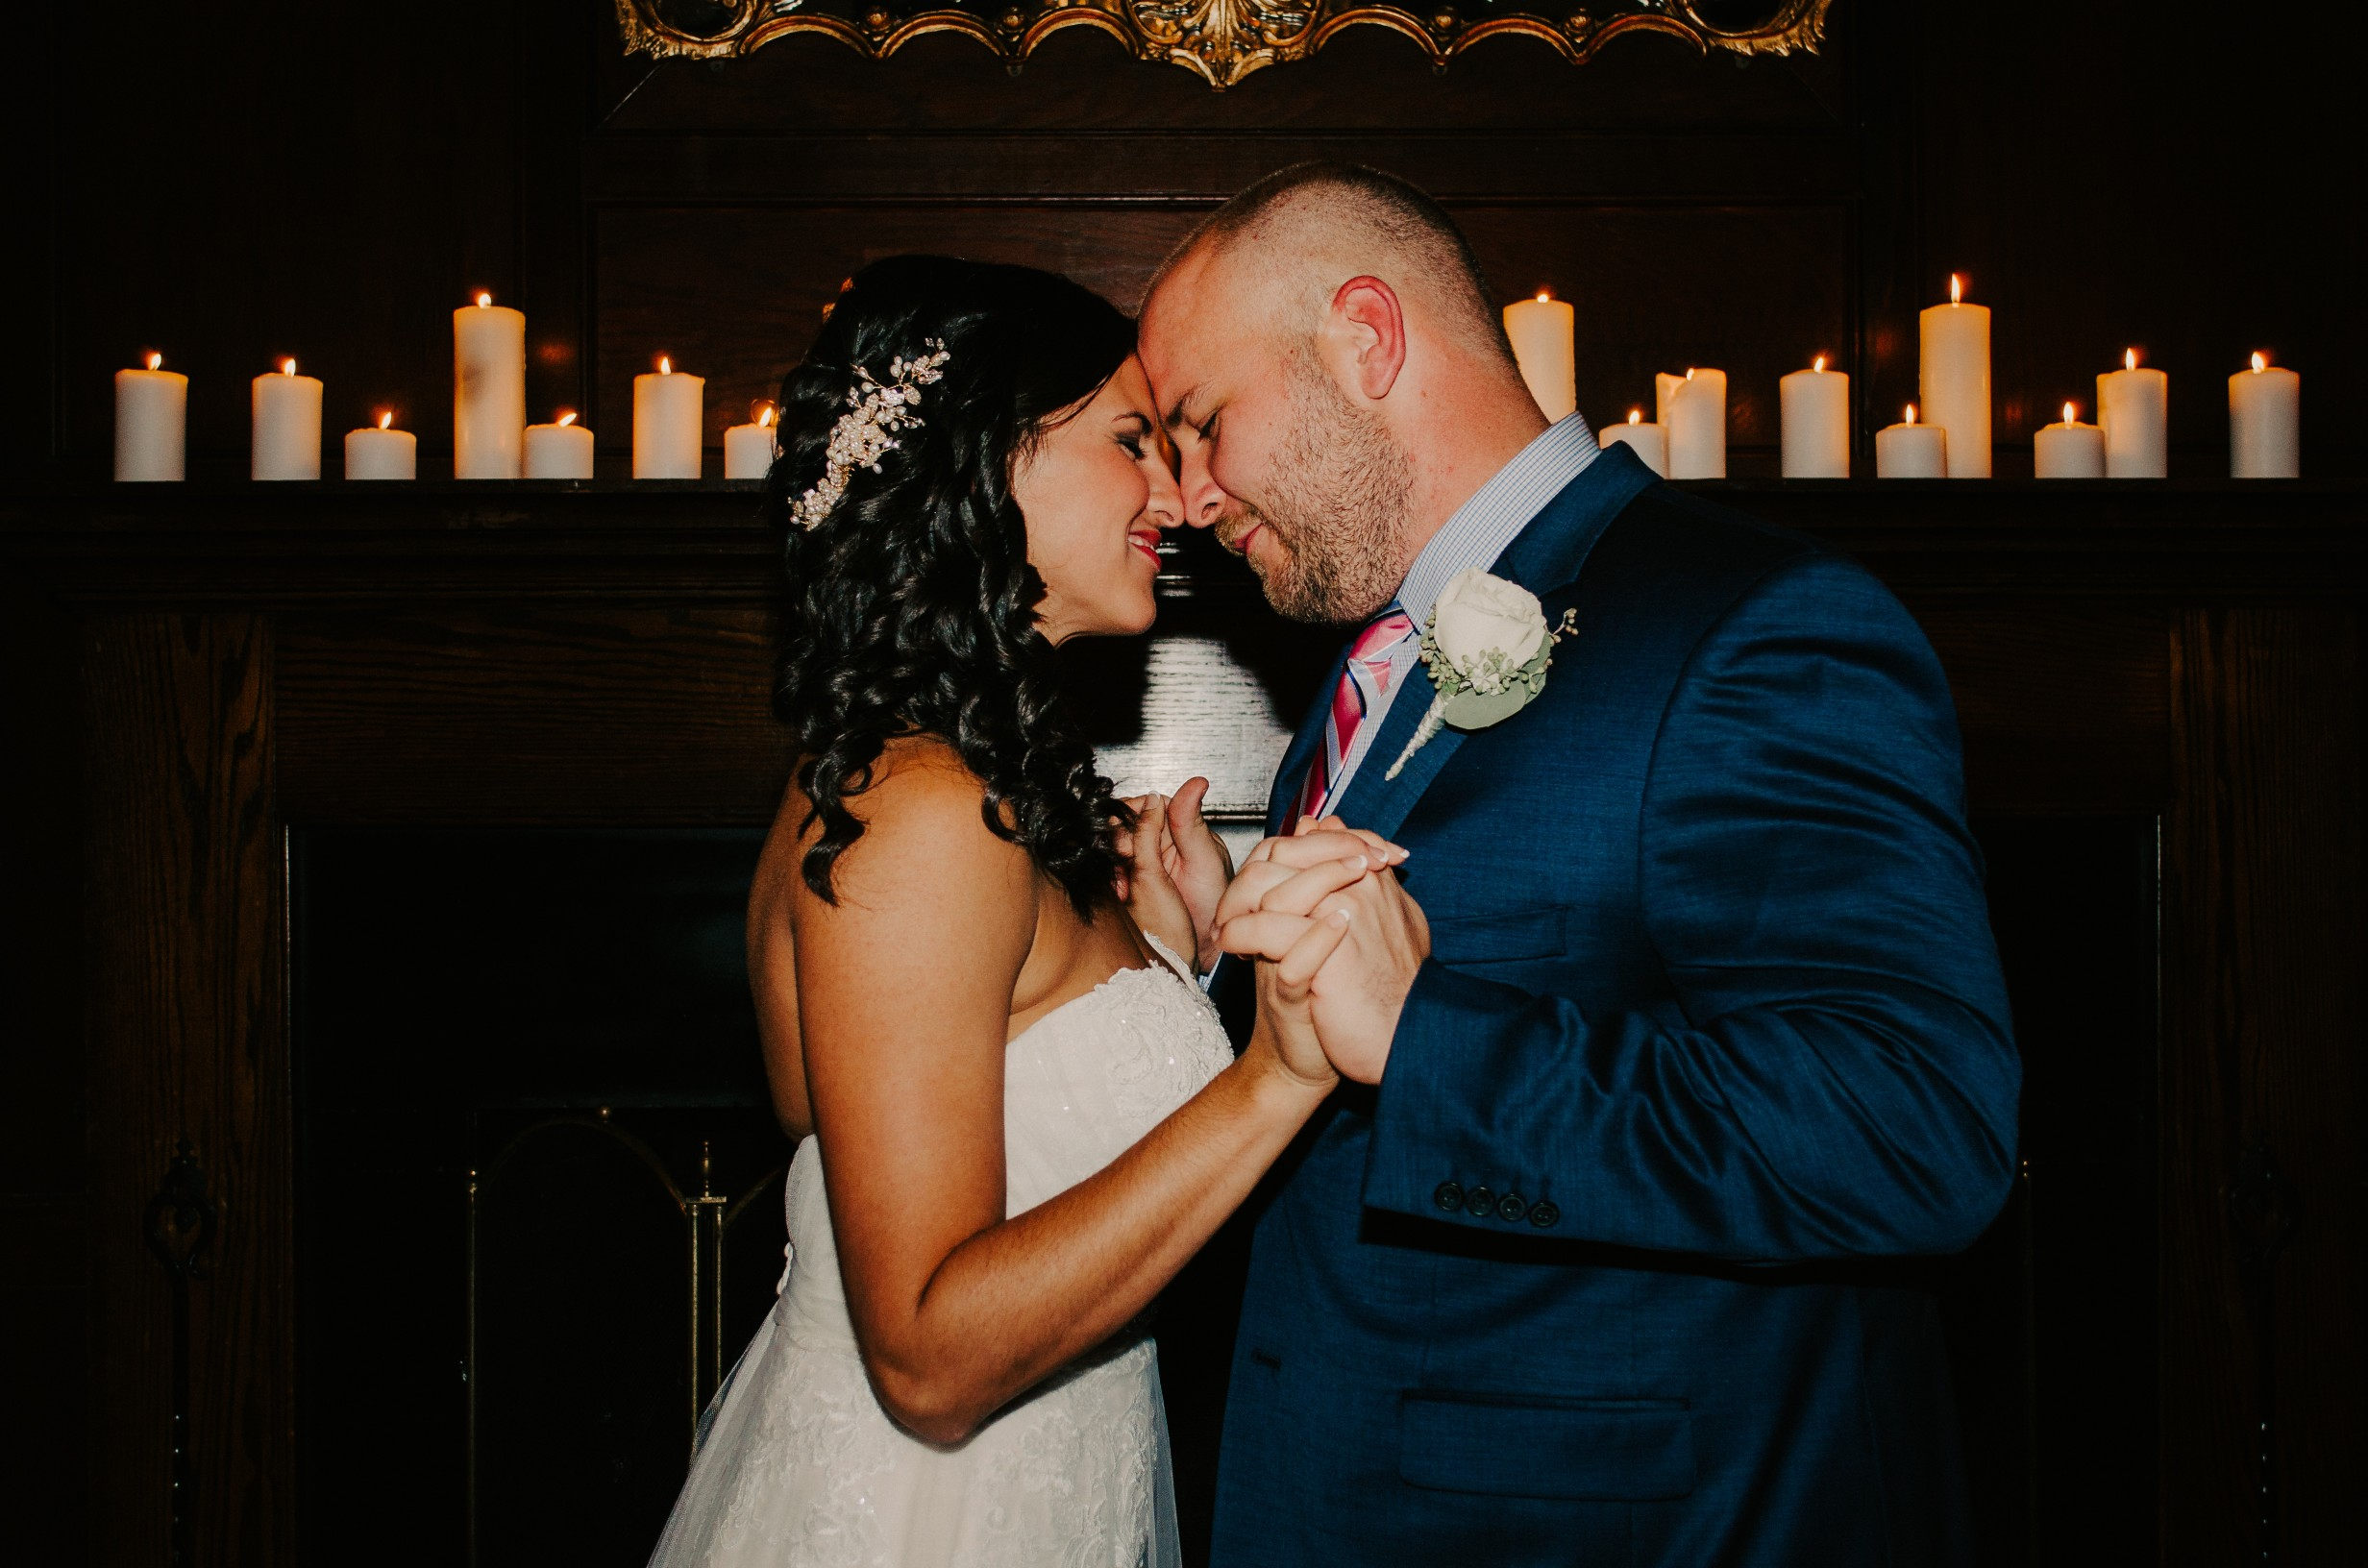 bride-groom-wedding-portrait.jpg.